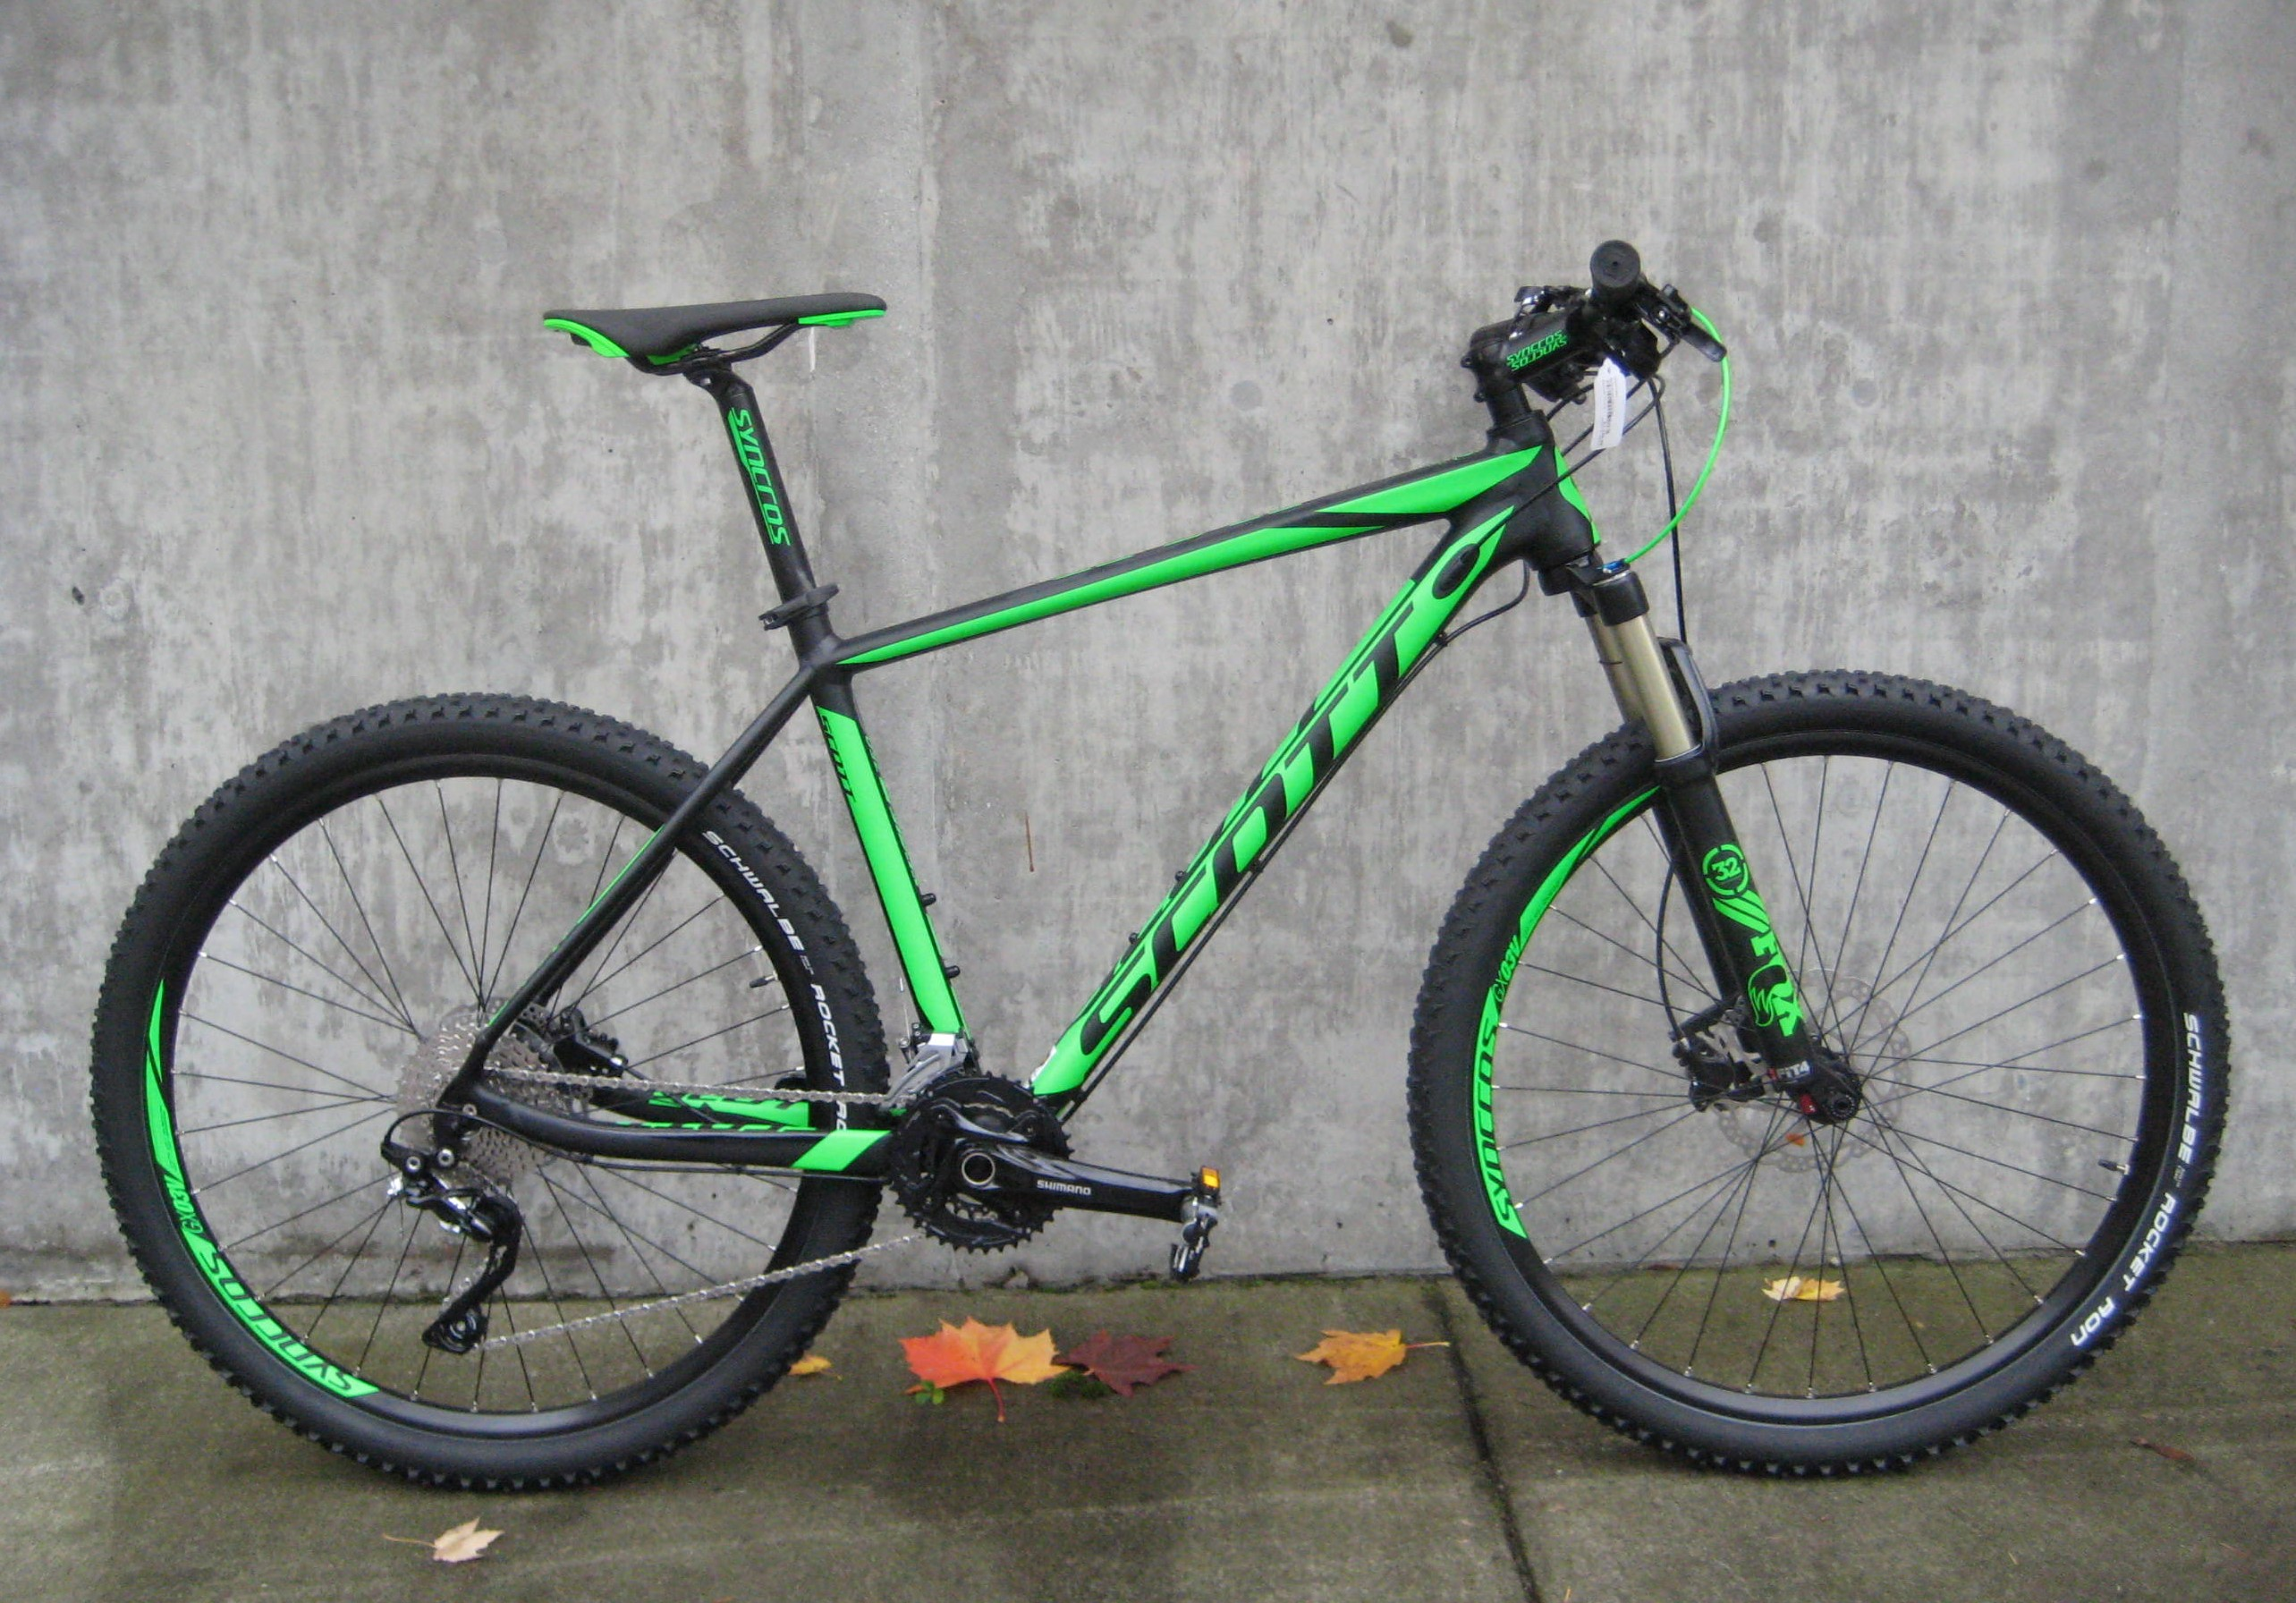 Scott Scale 930 940 750 And 730 Mountain Bikes On Sale Classic Cycle Bainbridge Island